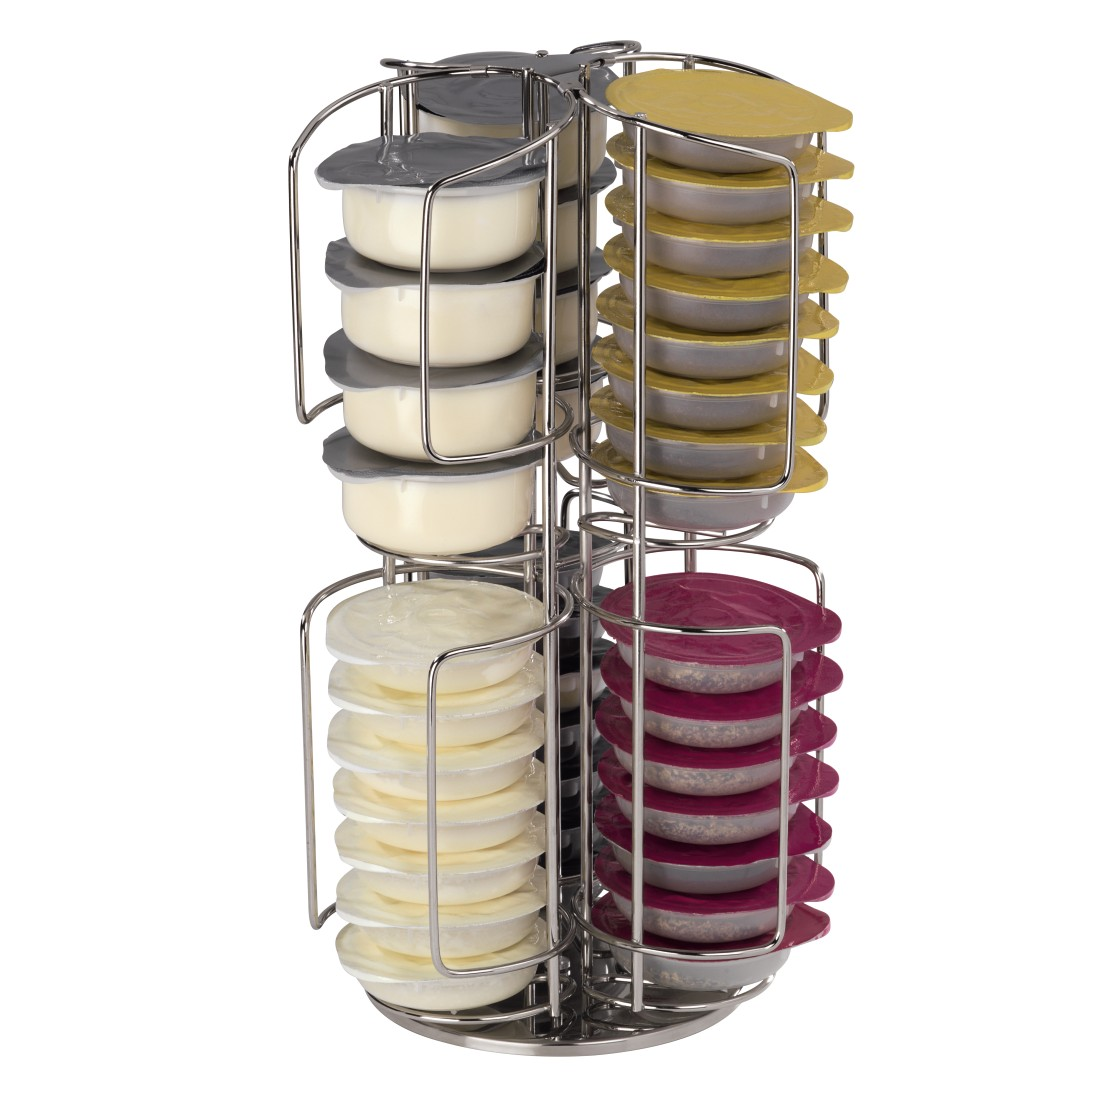 00111070 xavax kaffee kapselst nder rondello f r tassimo 48 kapseln. Black Bedroom Furniture Sets. Home Design Ideas